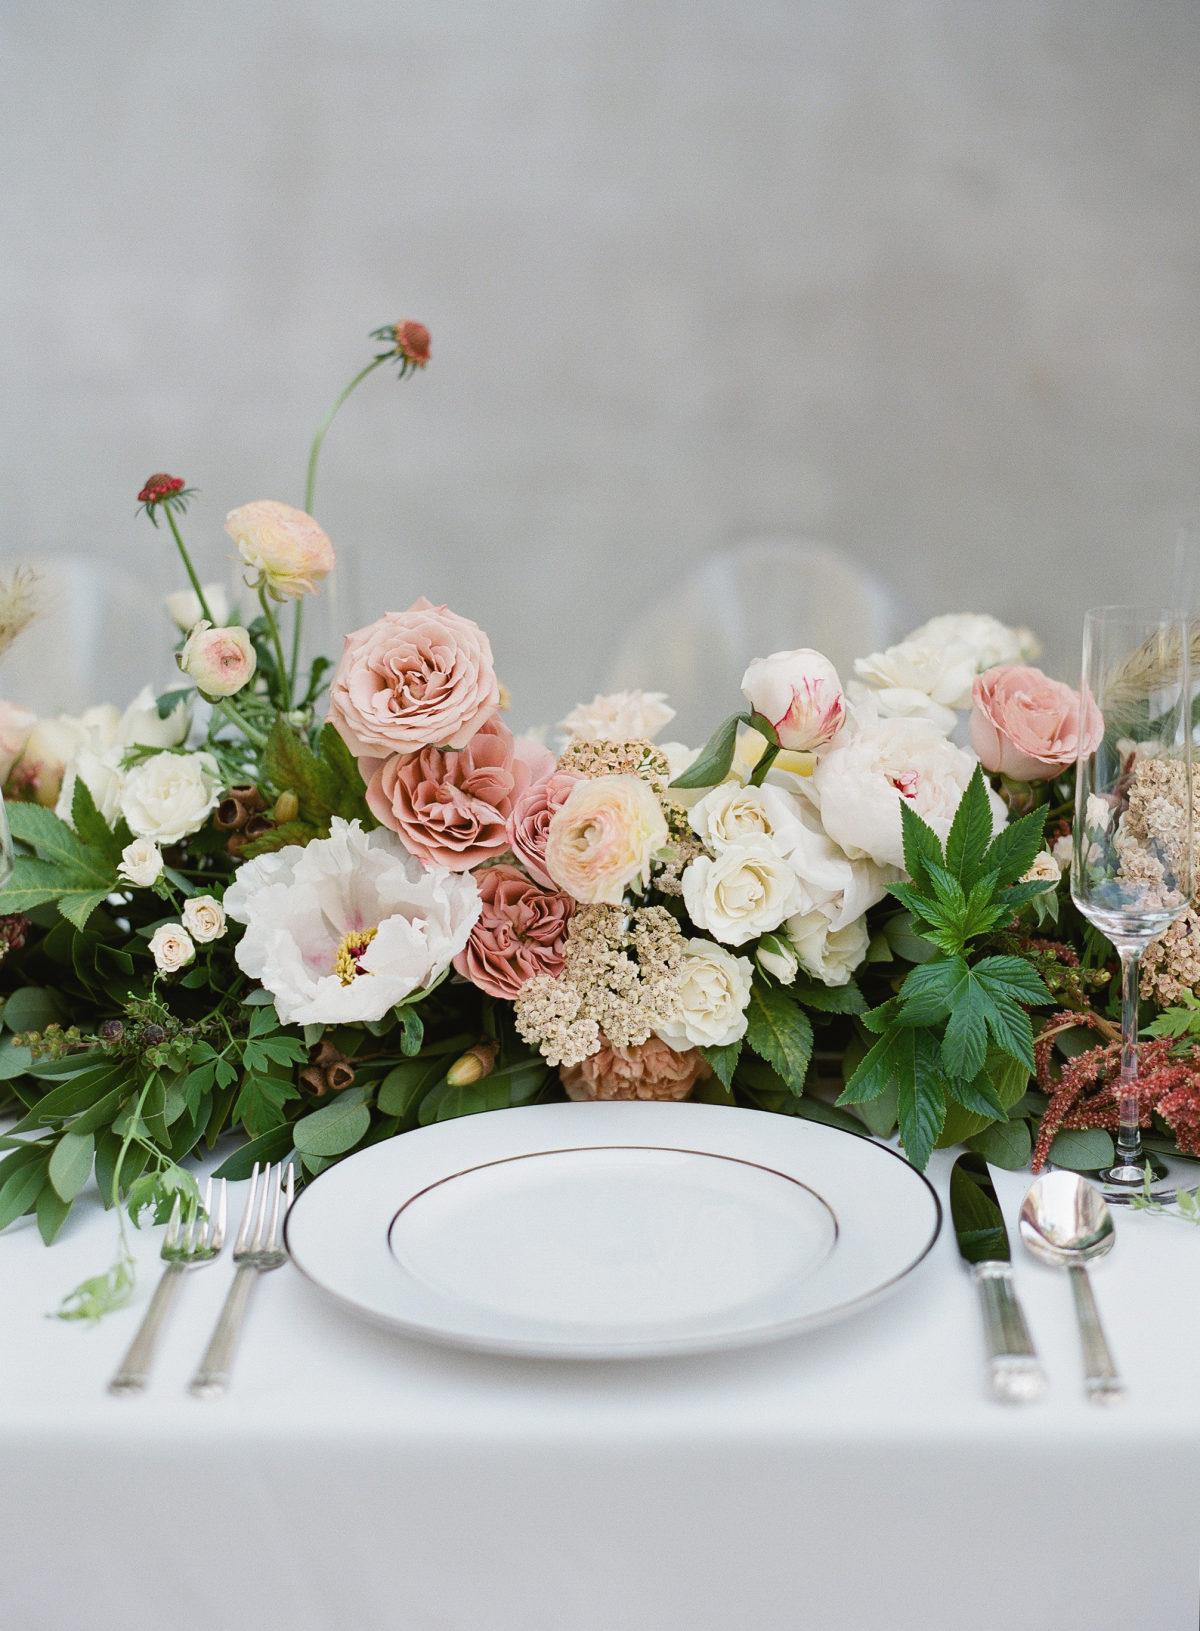 Flowers at wedding dinner table